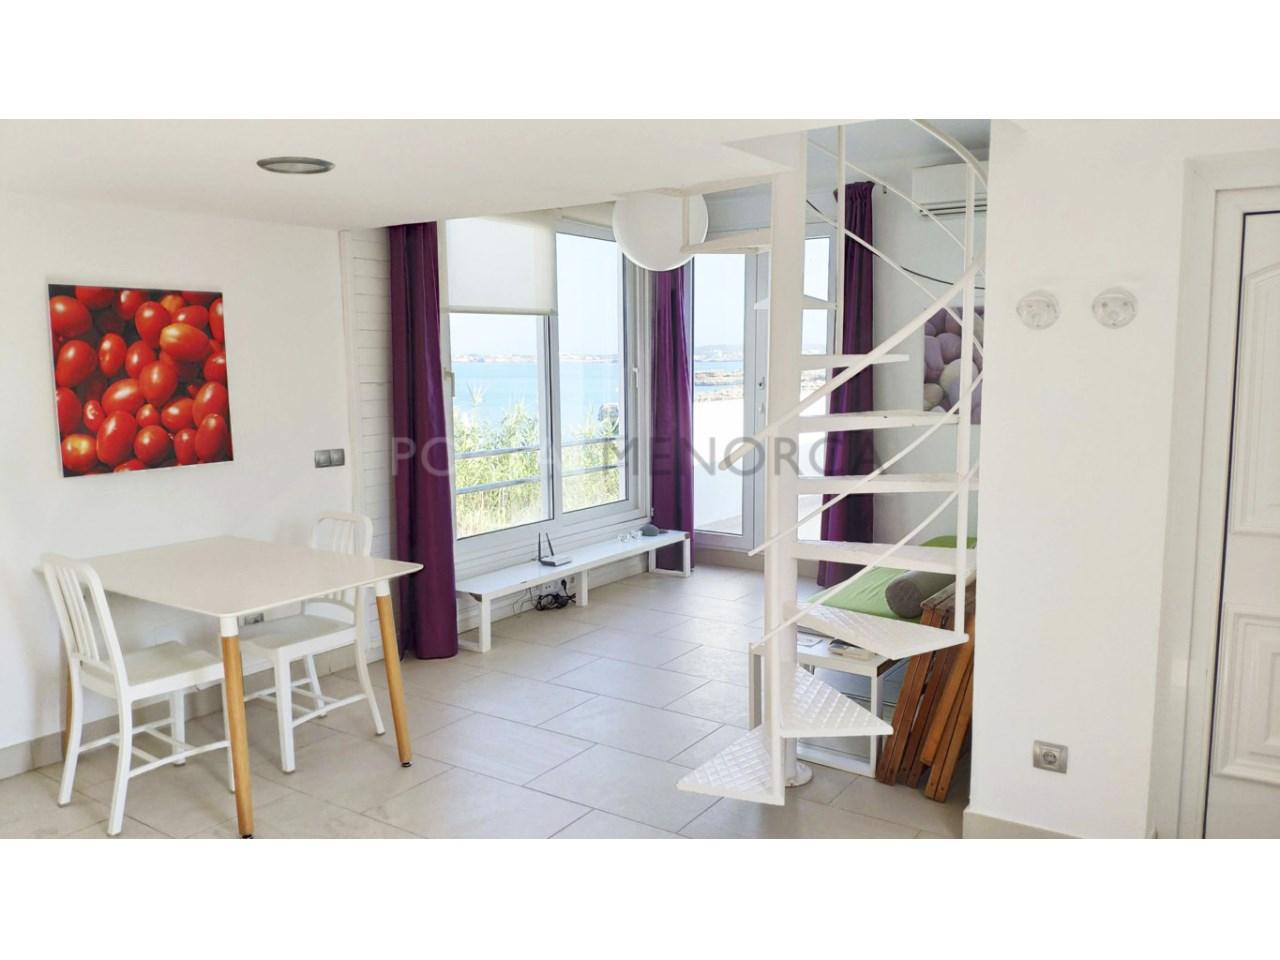 Modern apartment with sea views for sale in Cala Blanca Ciutadella Menorca-Living room